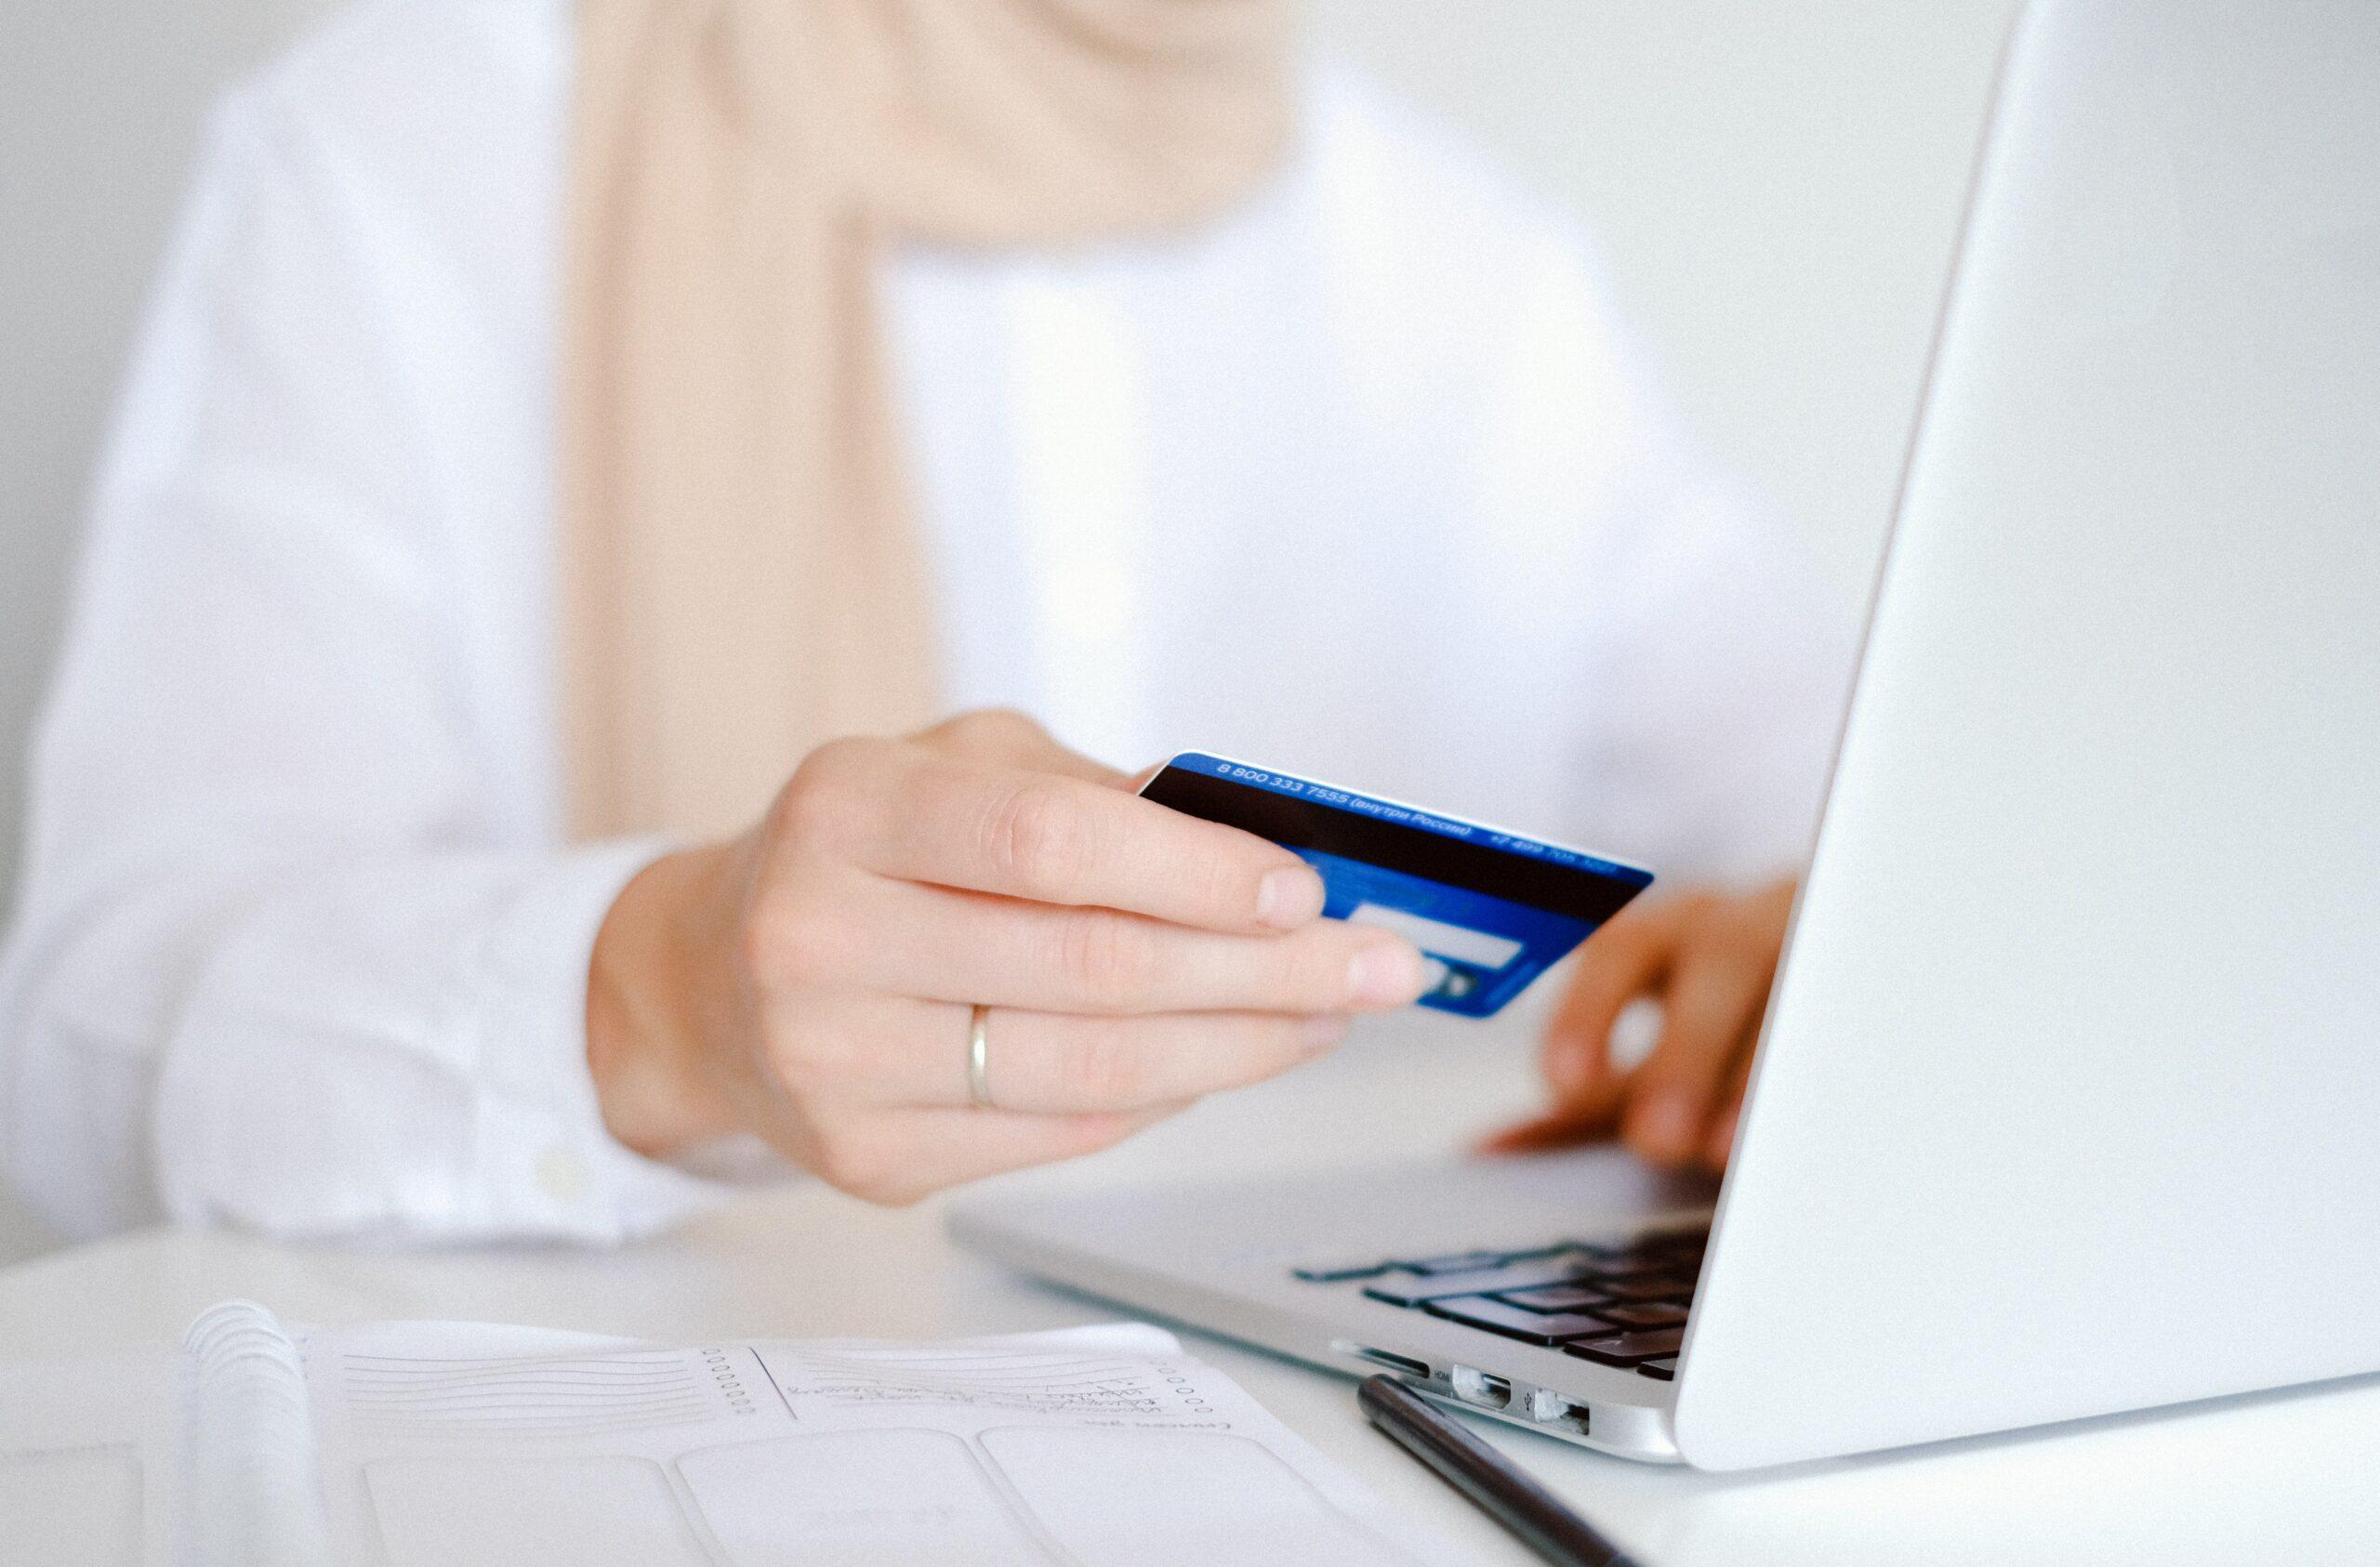 Онлайн кредит на картку Віза